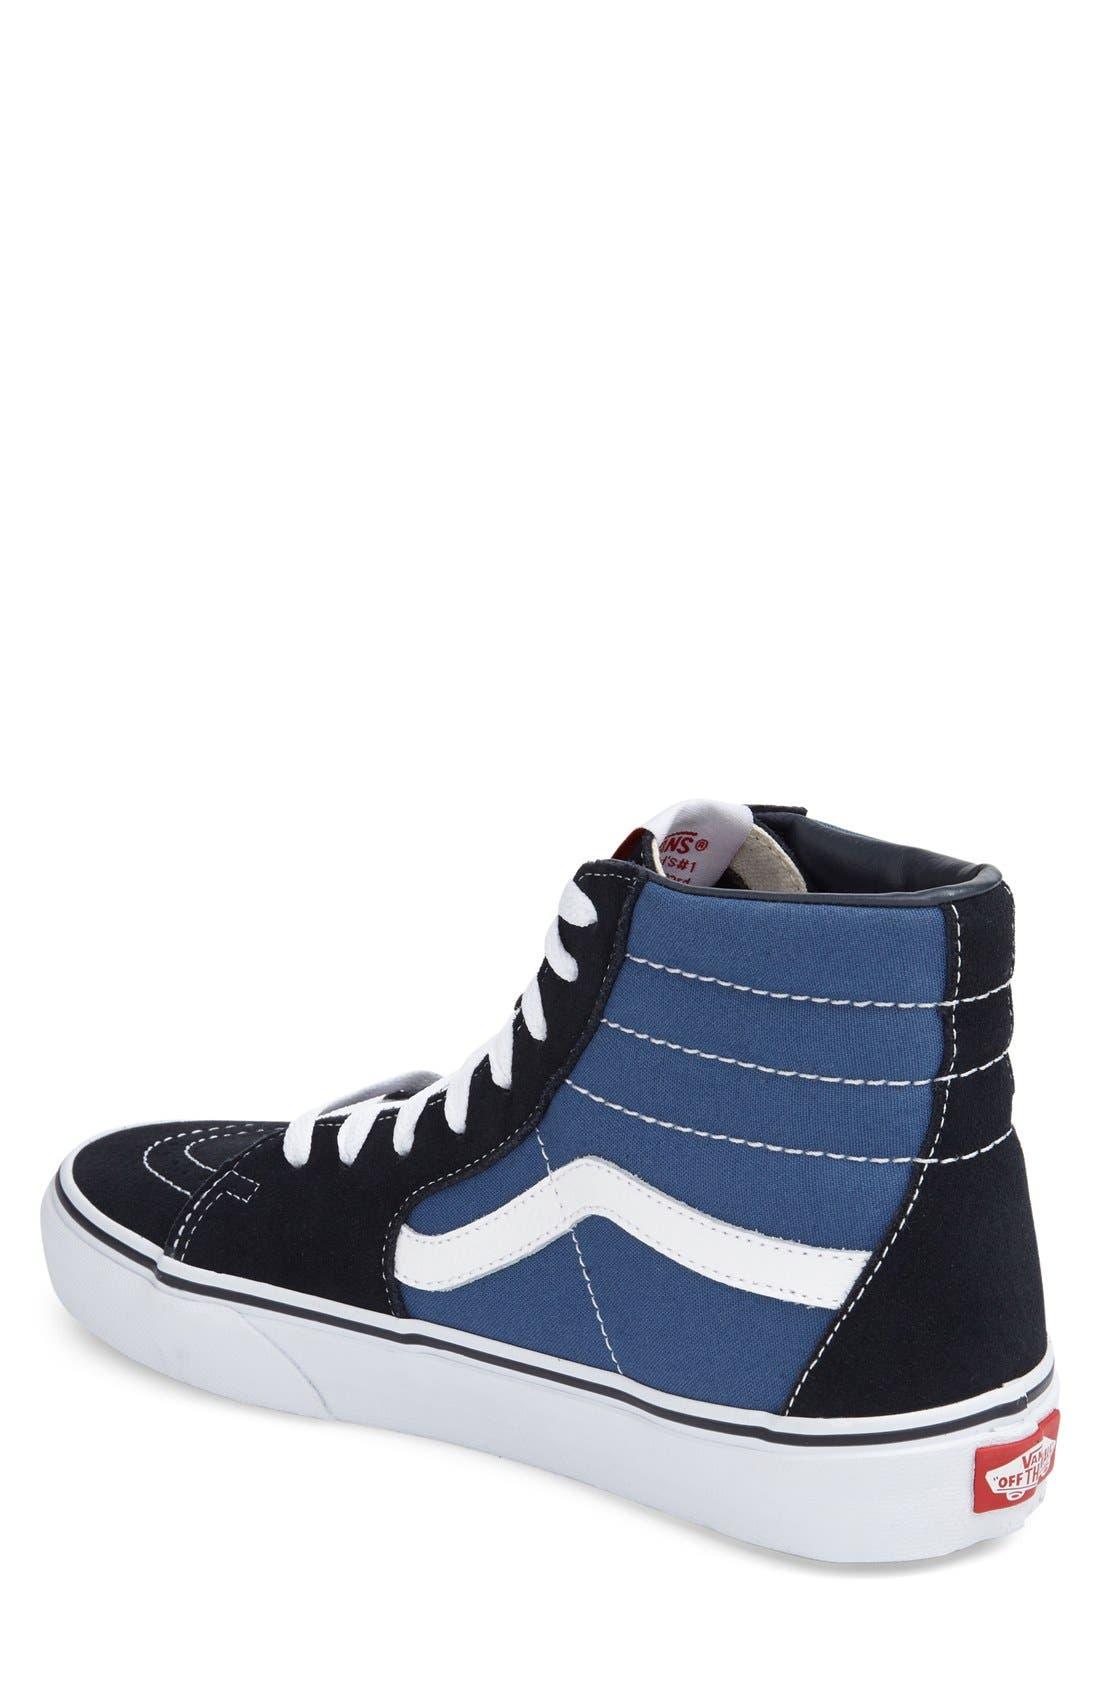 Alternate Image 2  - Vans 'Sk8-Hi' Sneaker (Men)